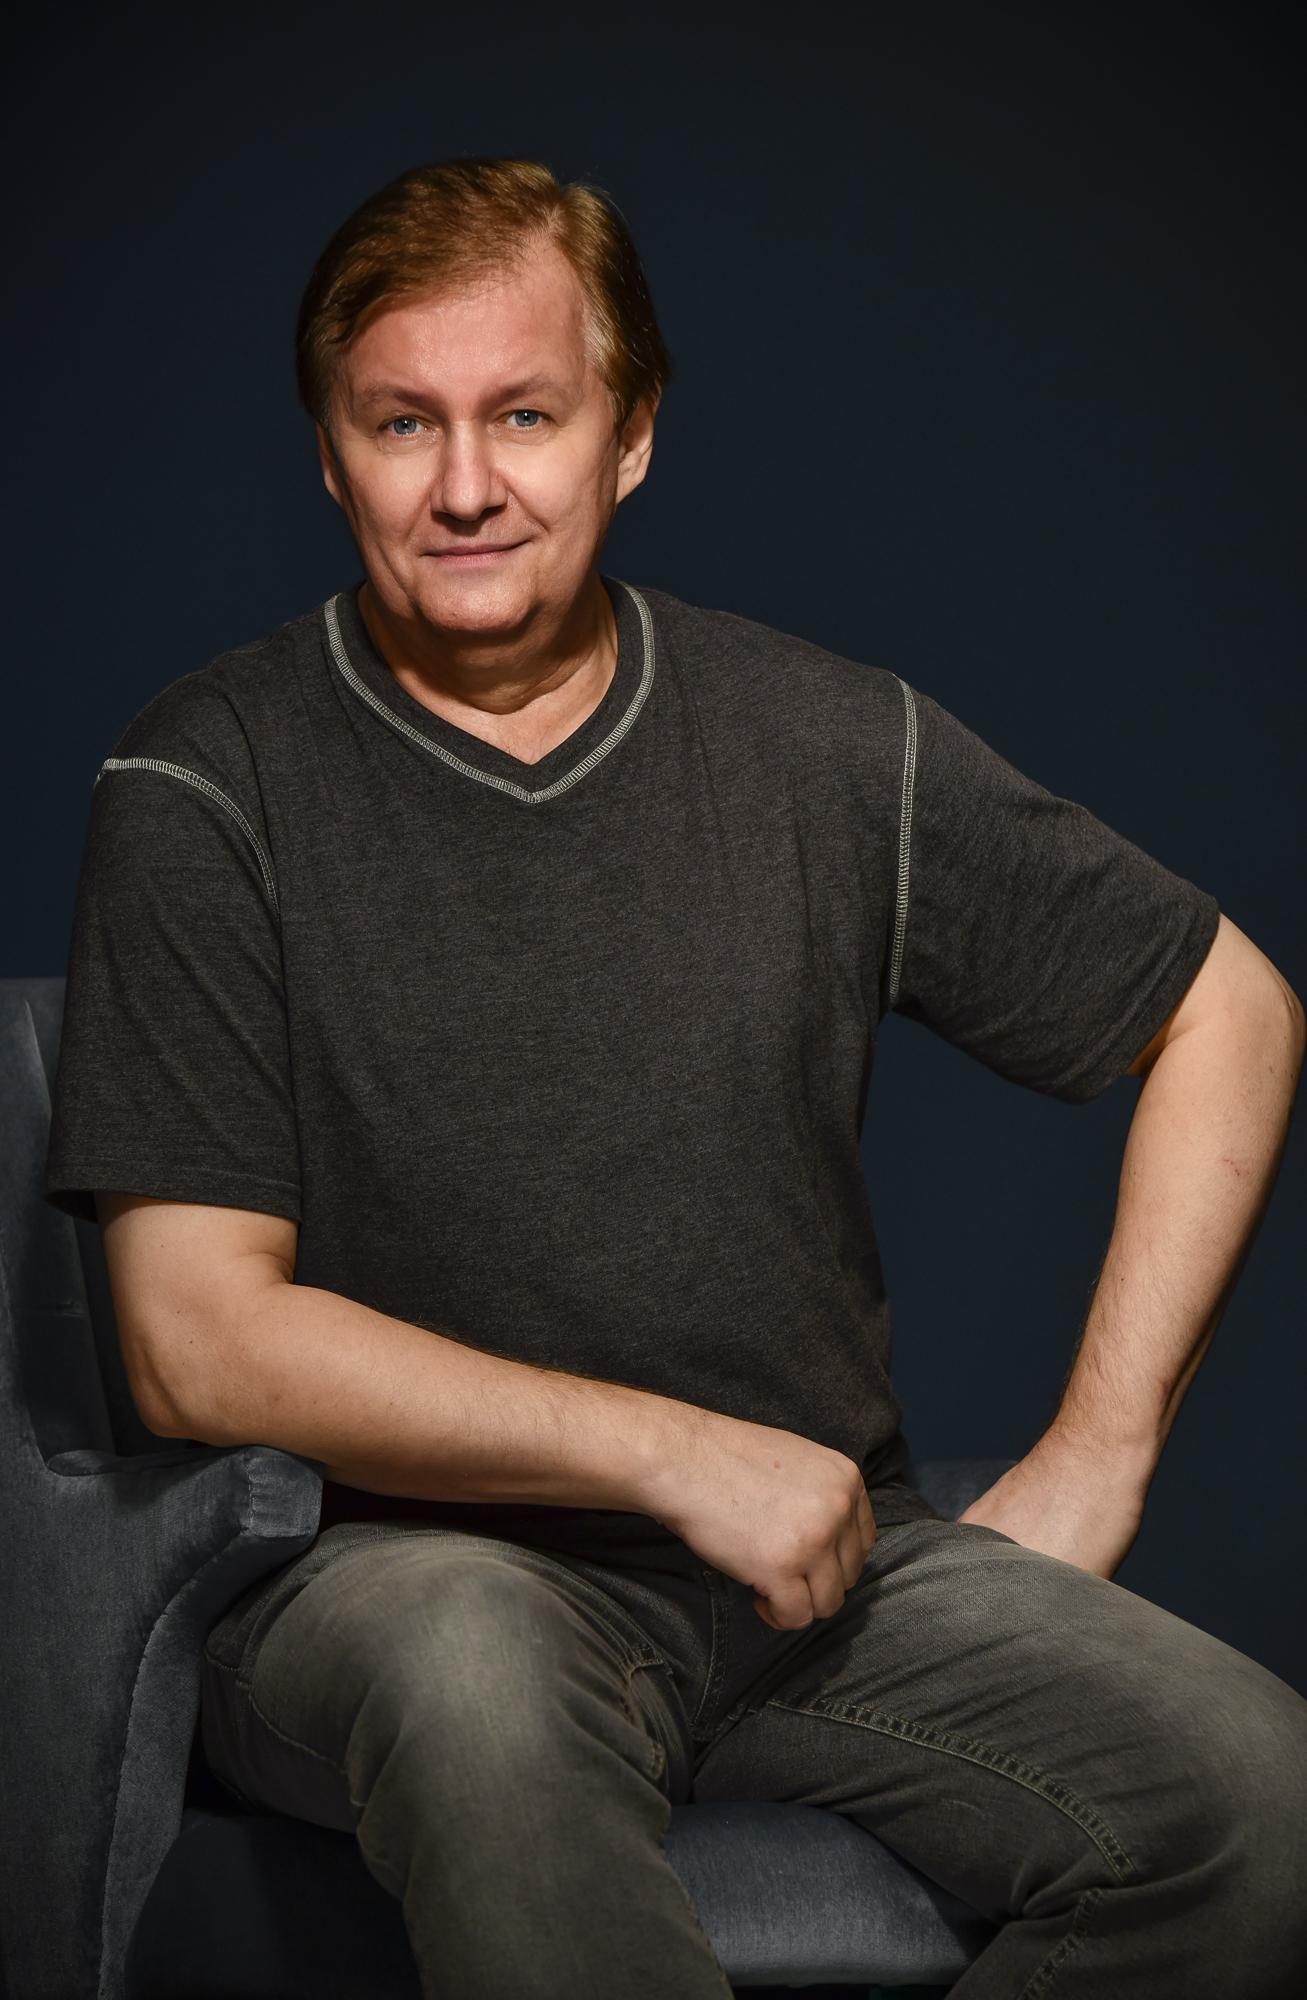 Milan Rudolecký